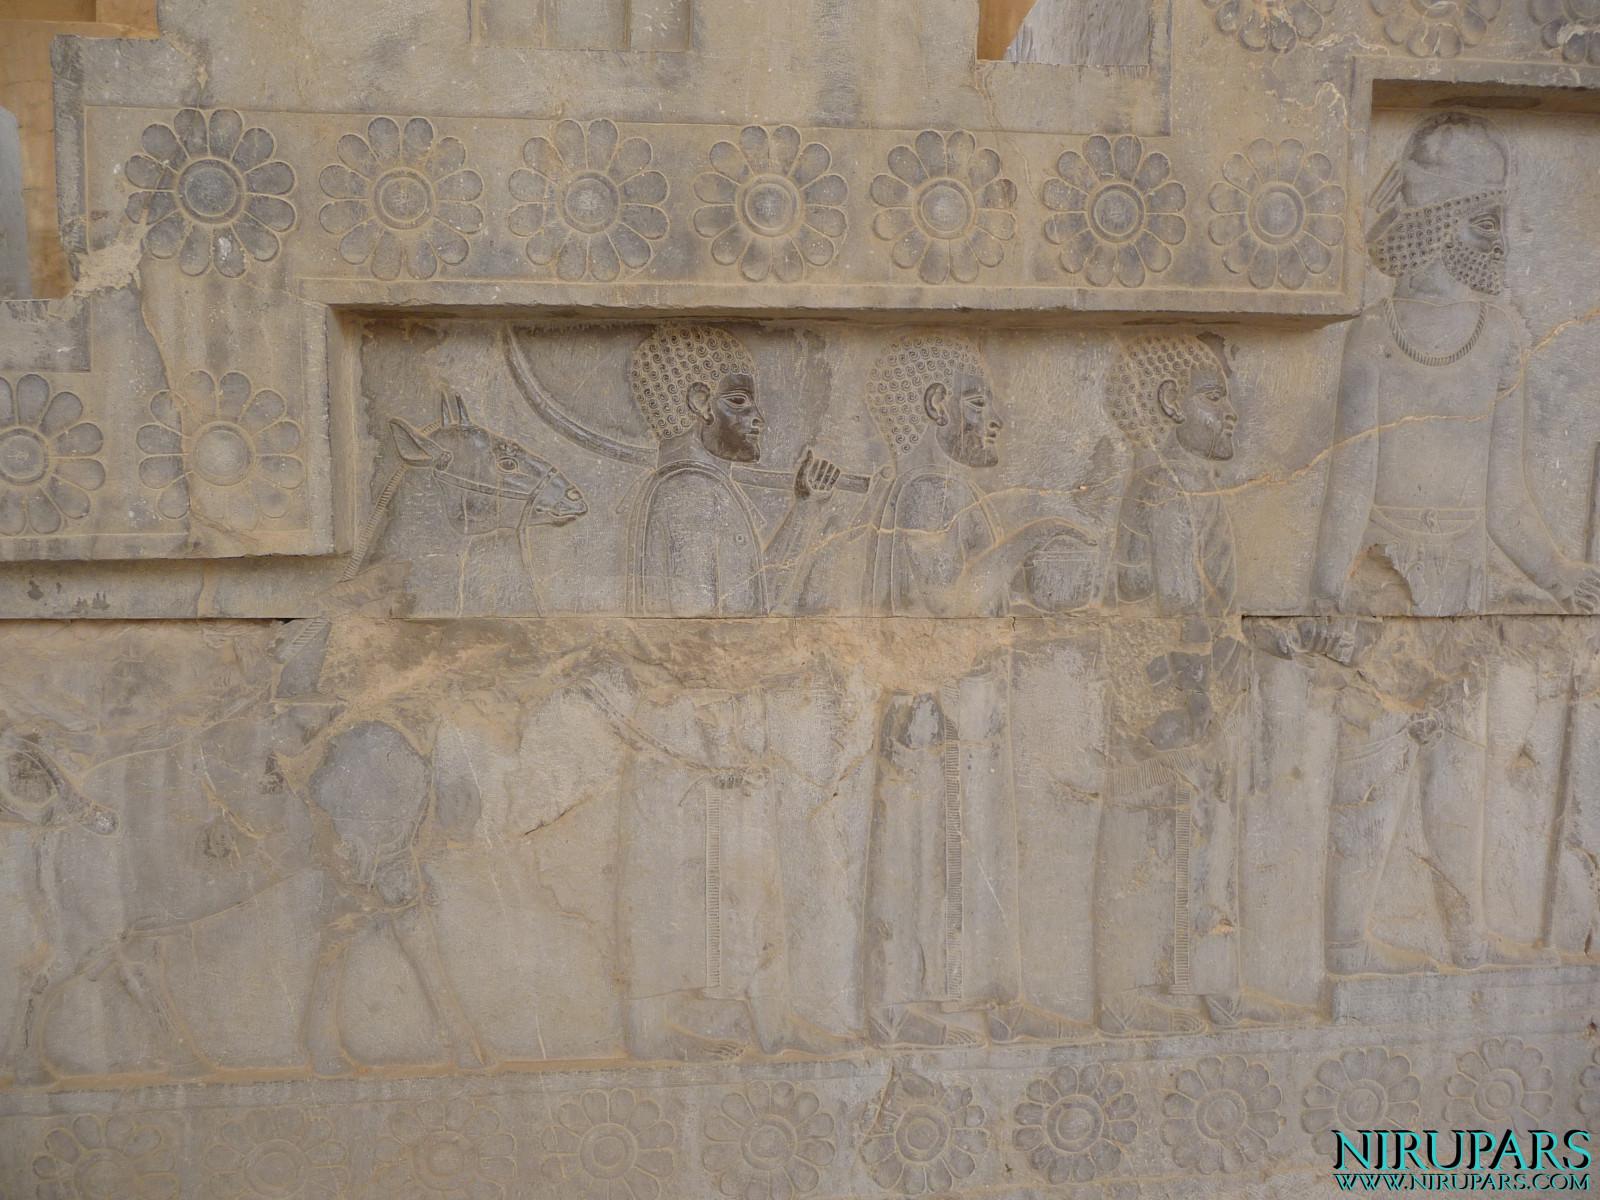 Persepolis - Apadana - East Portico - Delegation Ethiopia